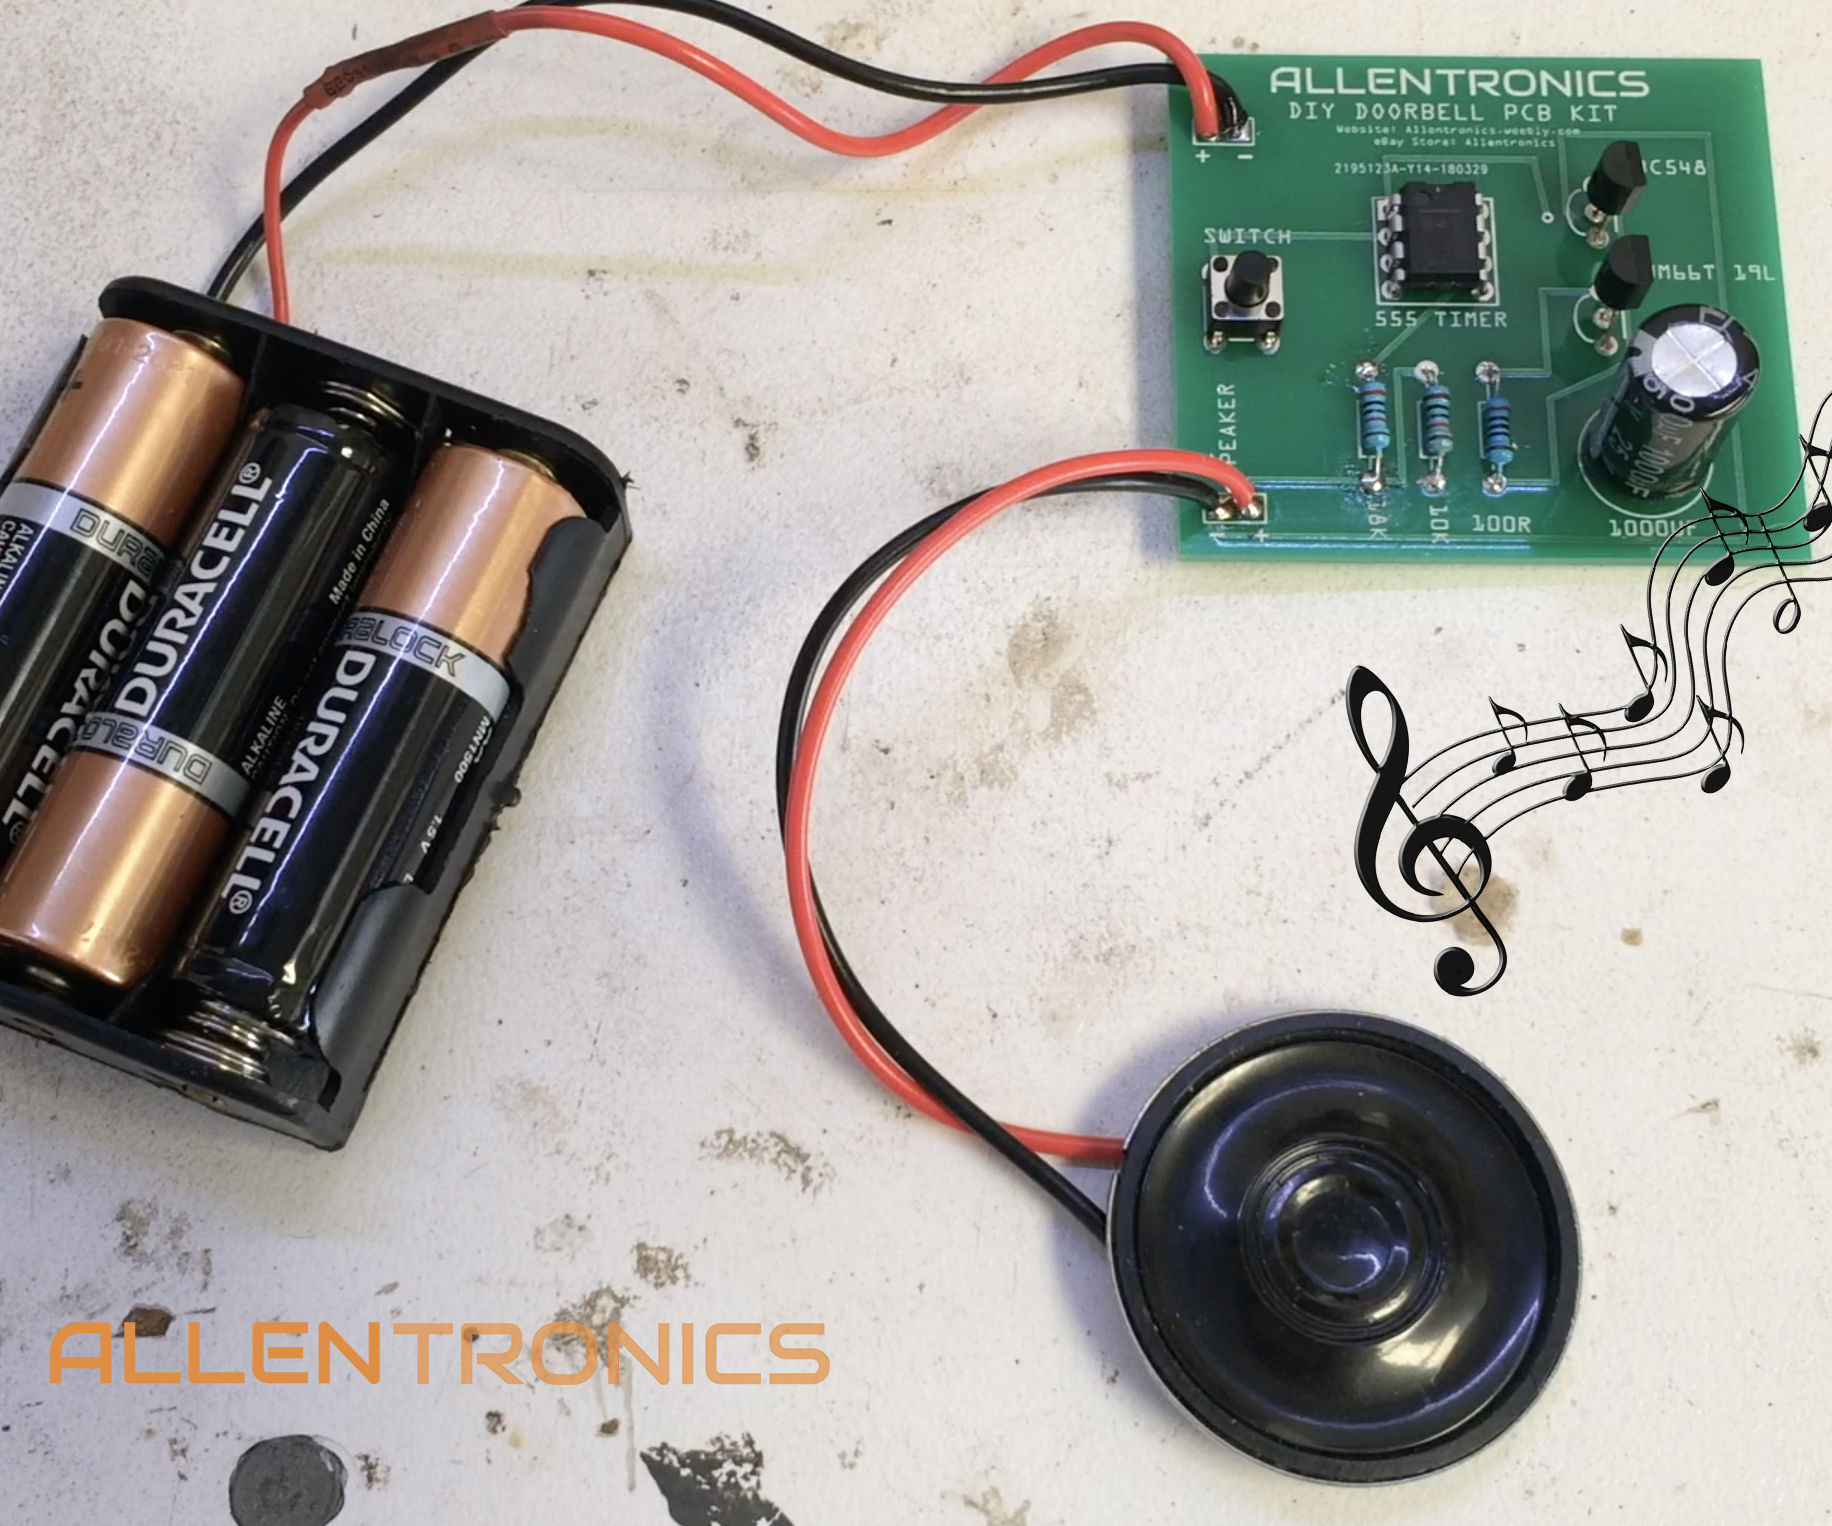 DIY Doorbell With 555 Timer + UM66T Chip